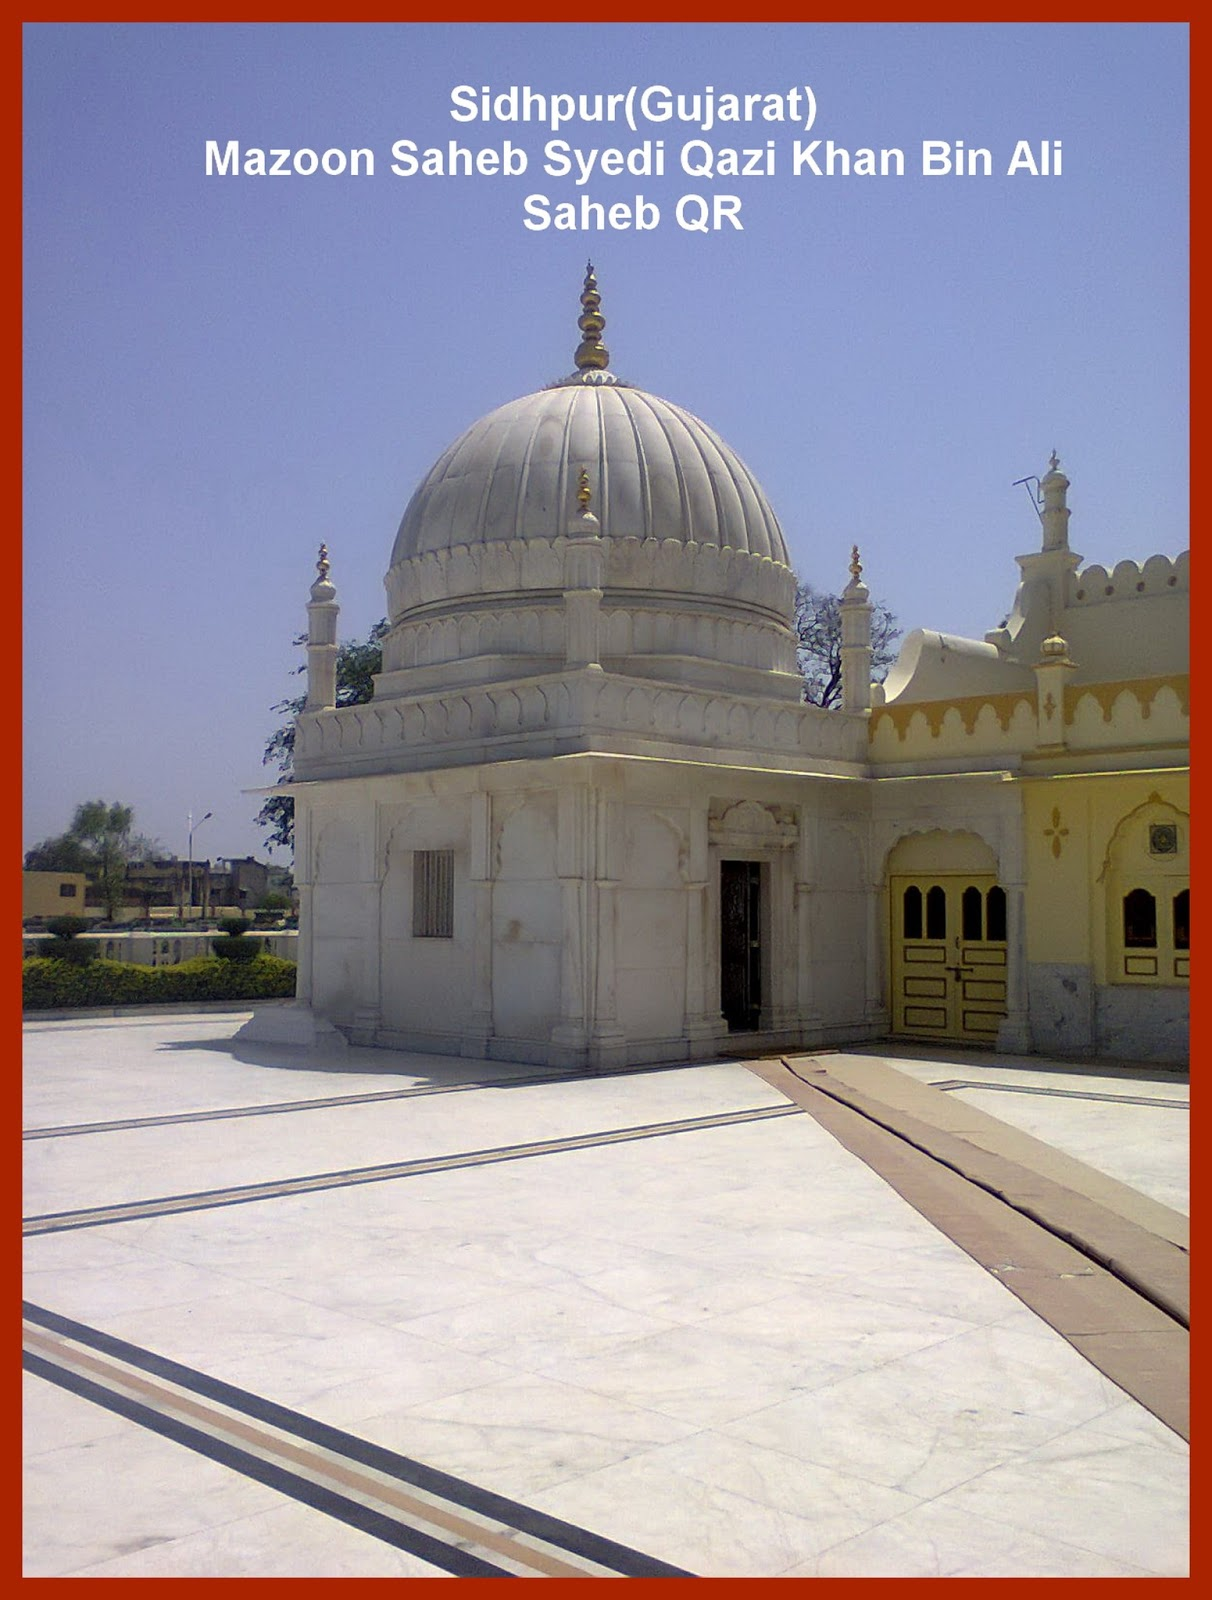 Sidhpur Ziyarat-Gujarat